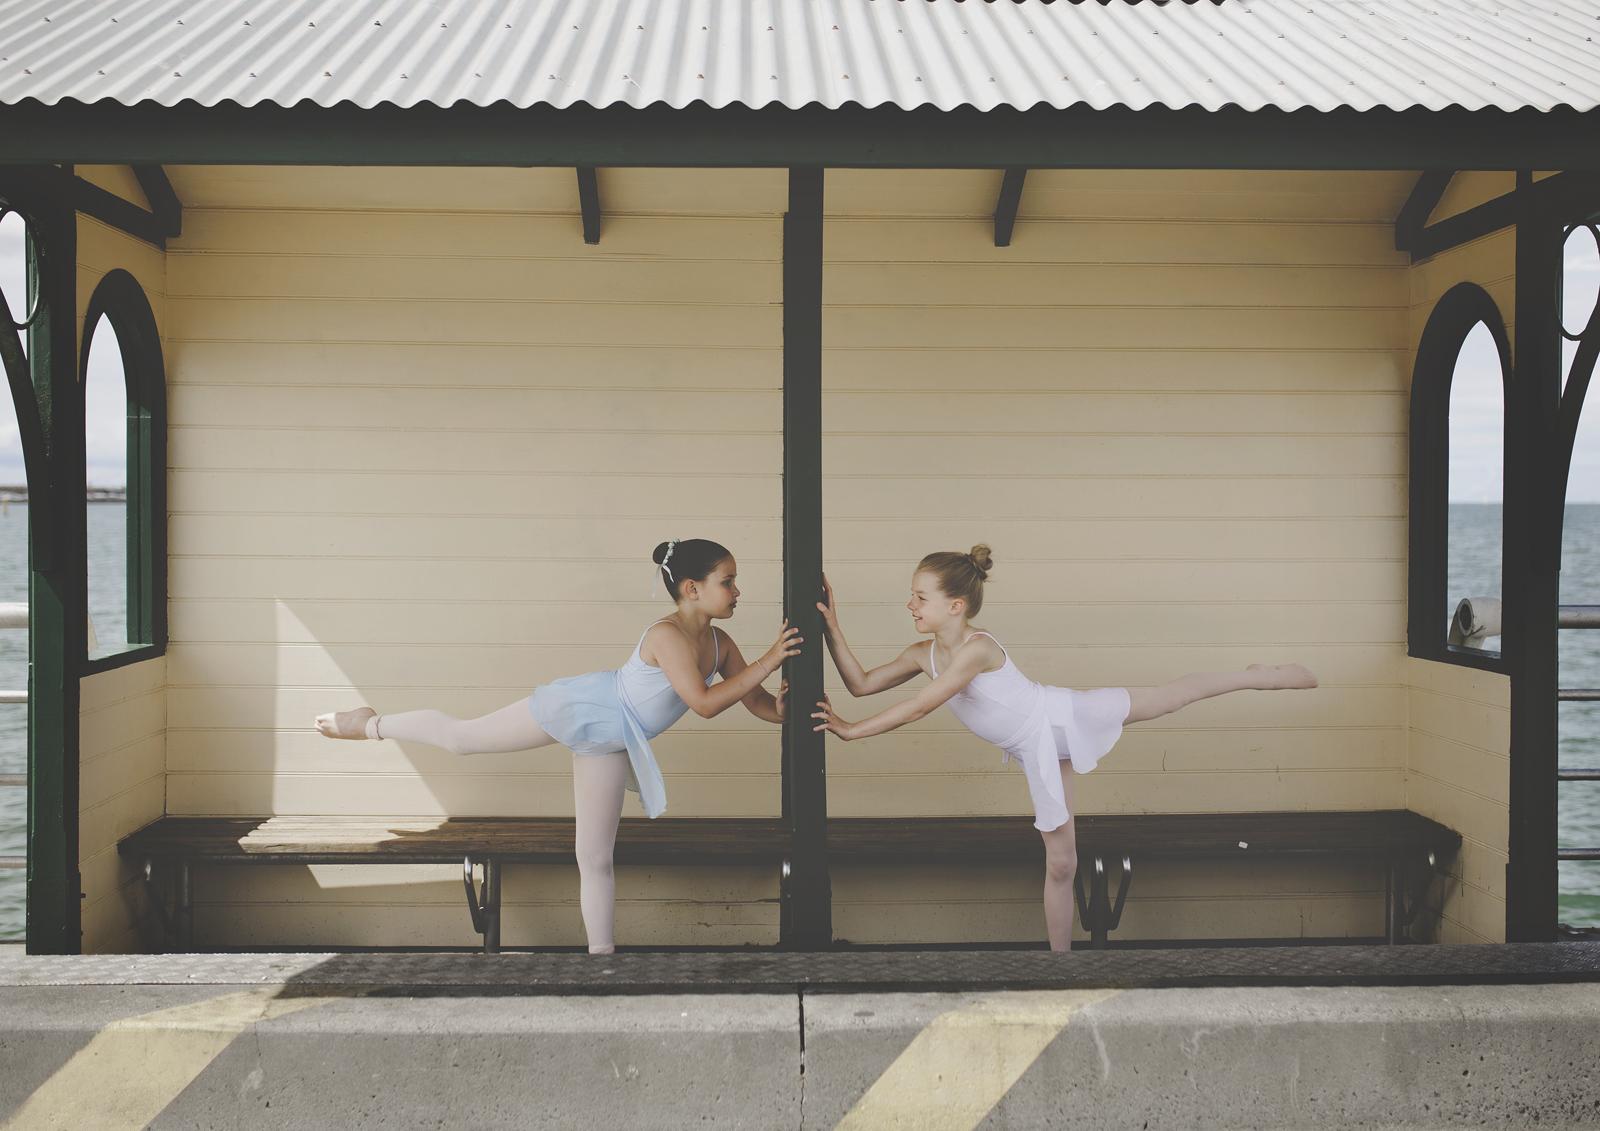 St Kilda Beach ballet dancing!